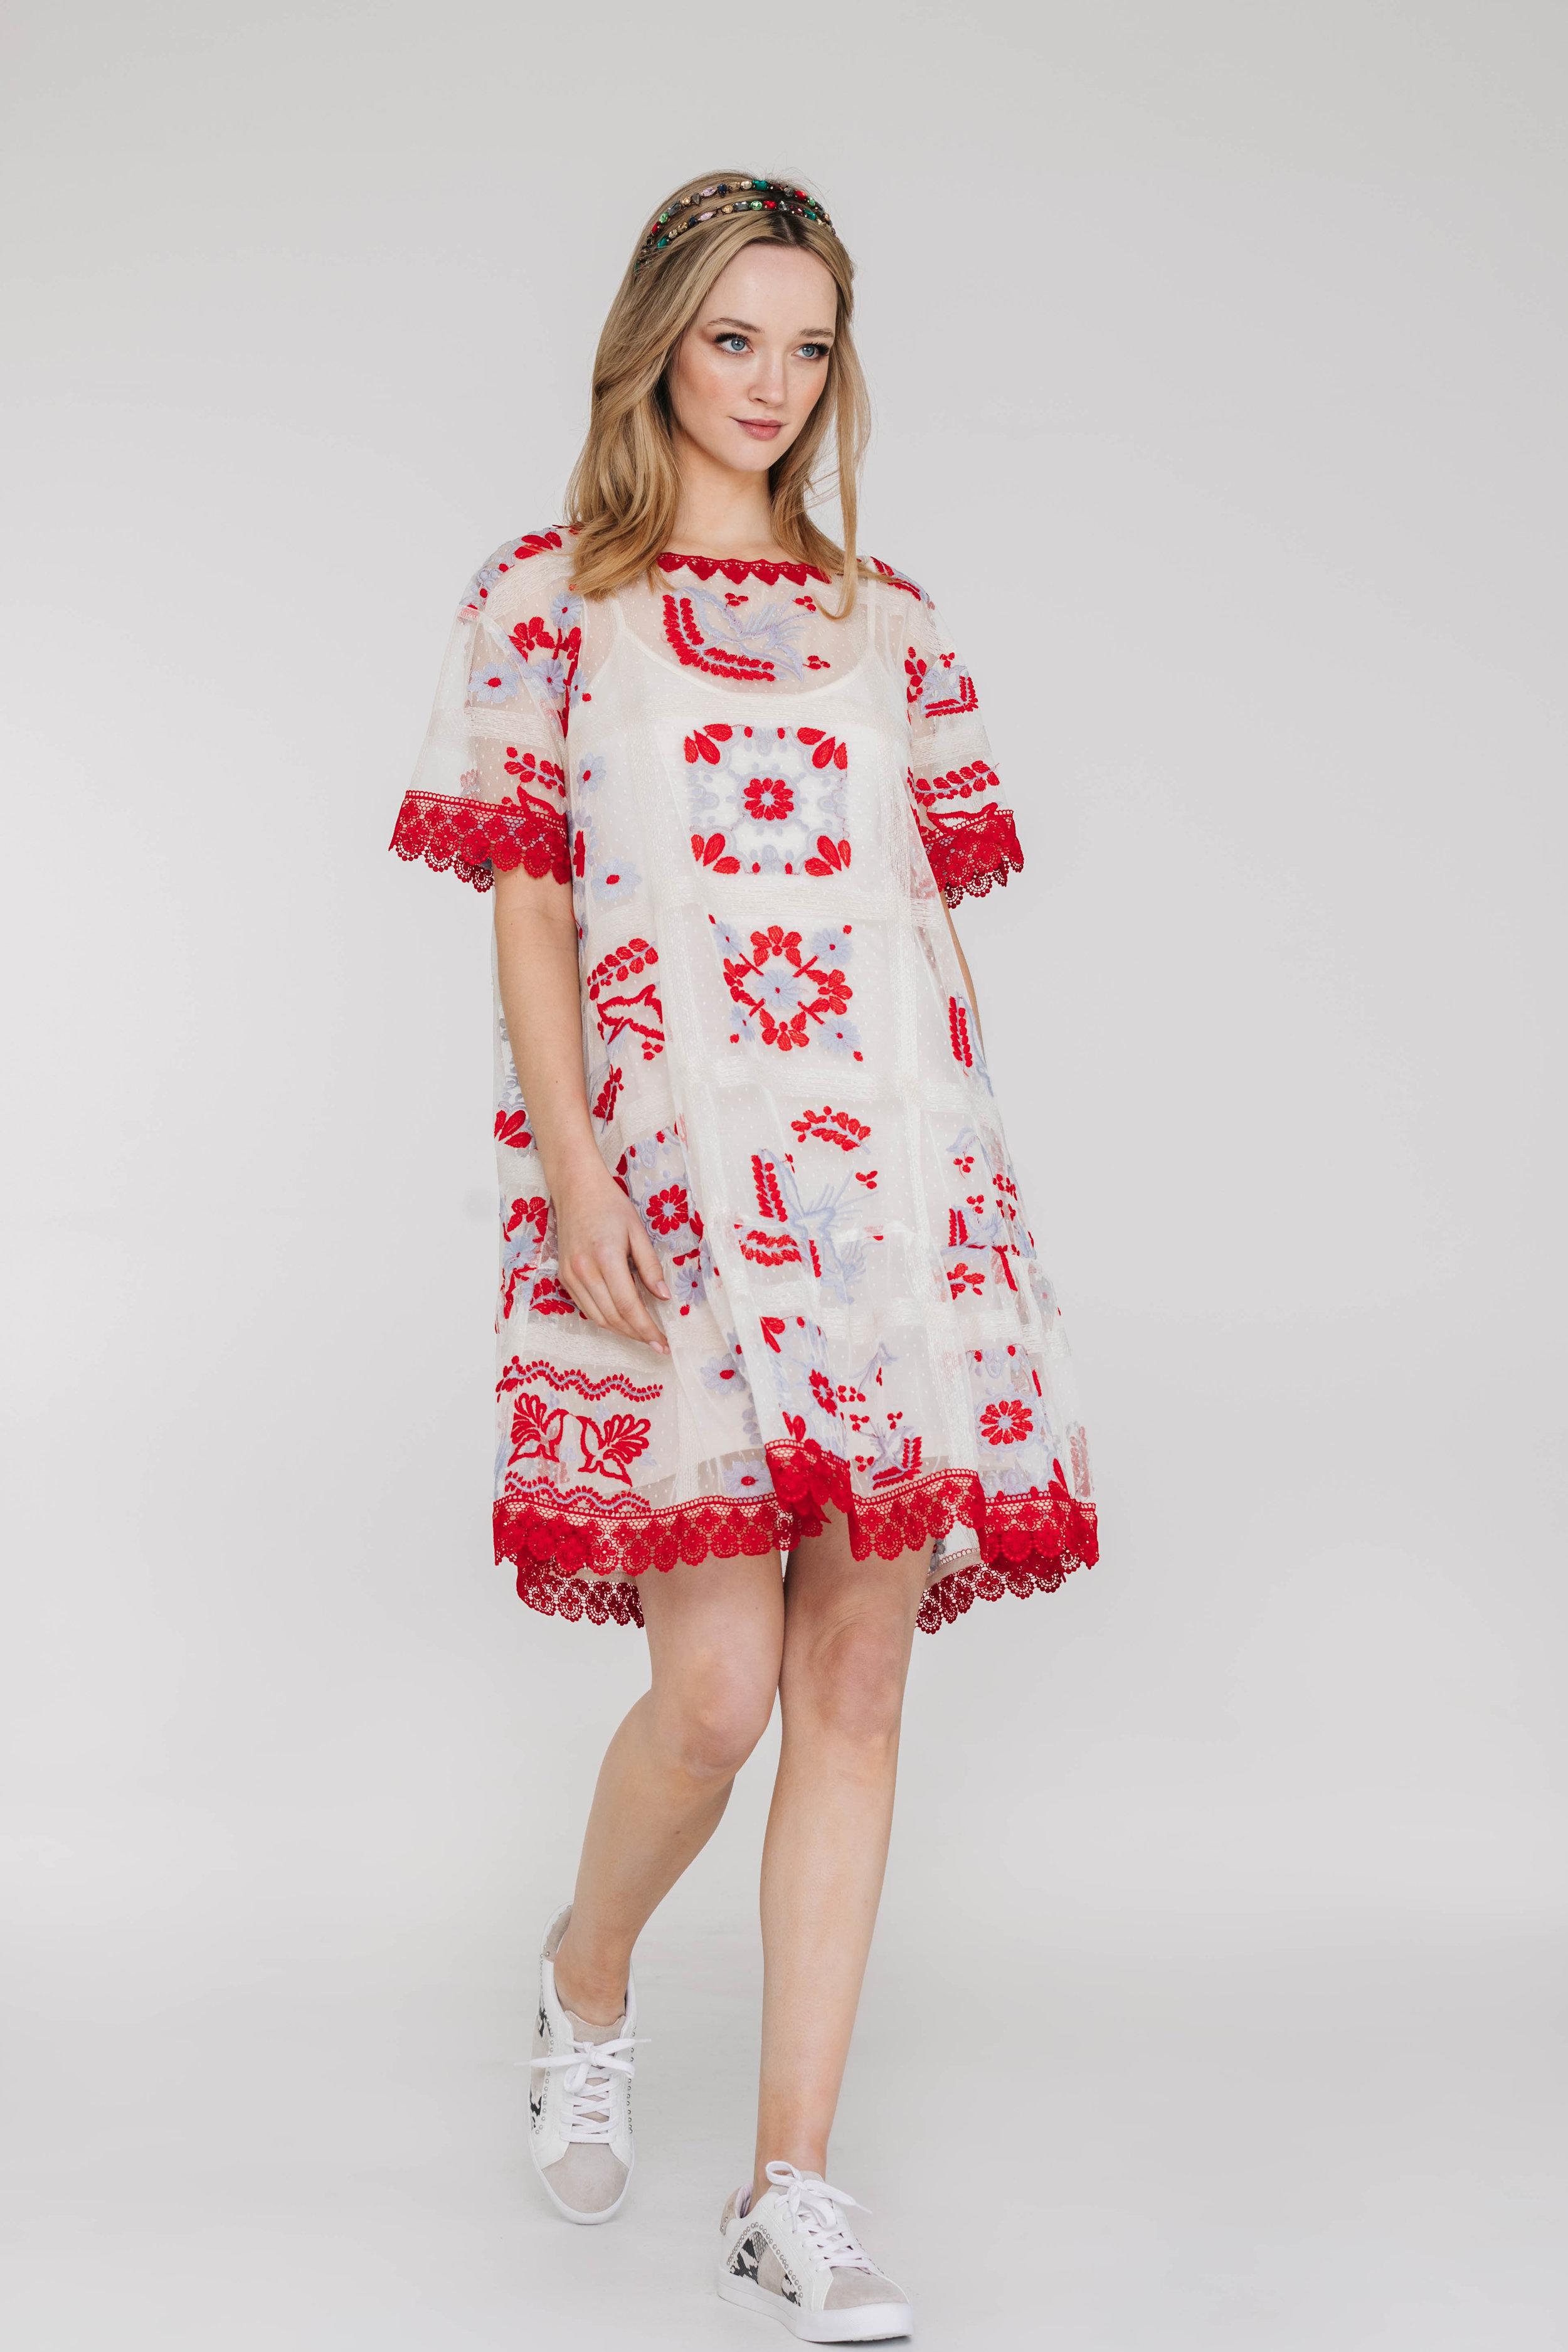 Tulip Dress 6440N Windows Ivory